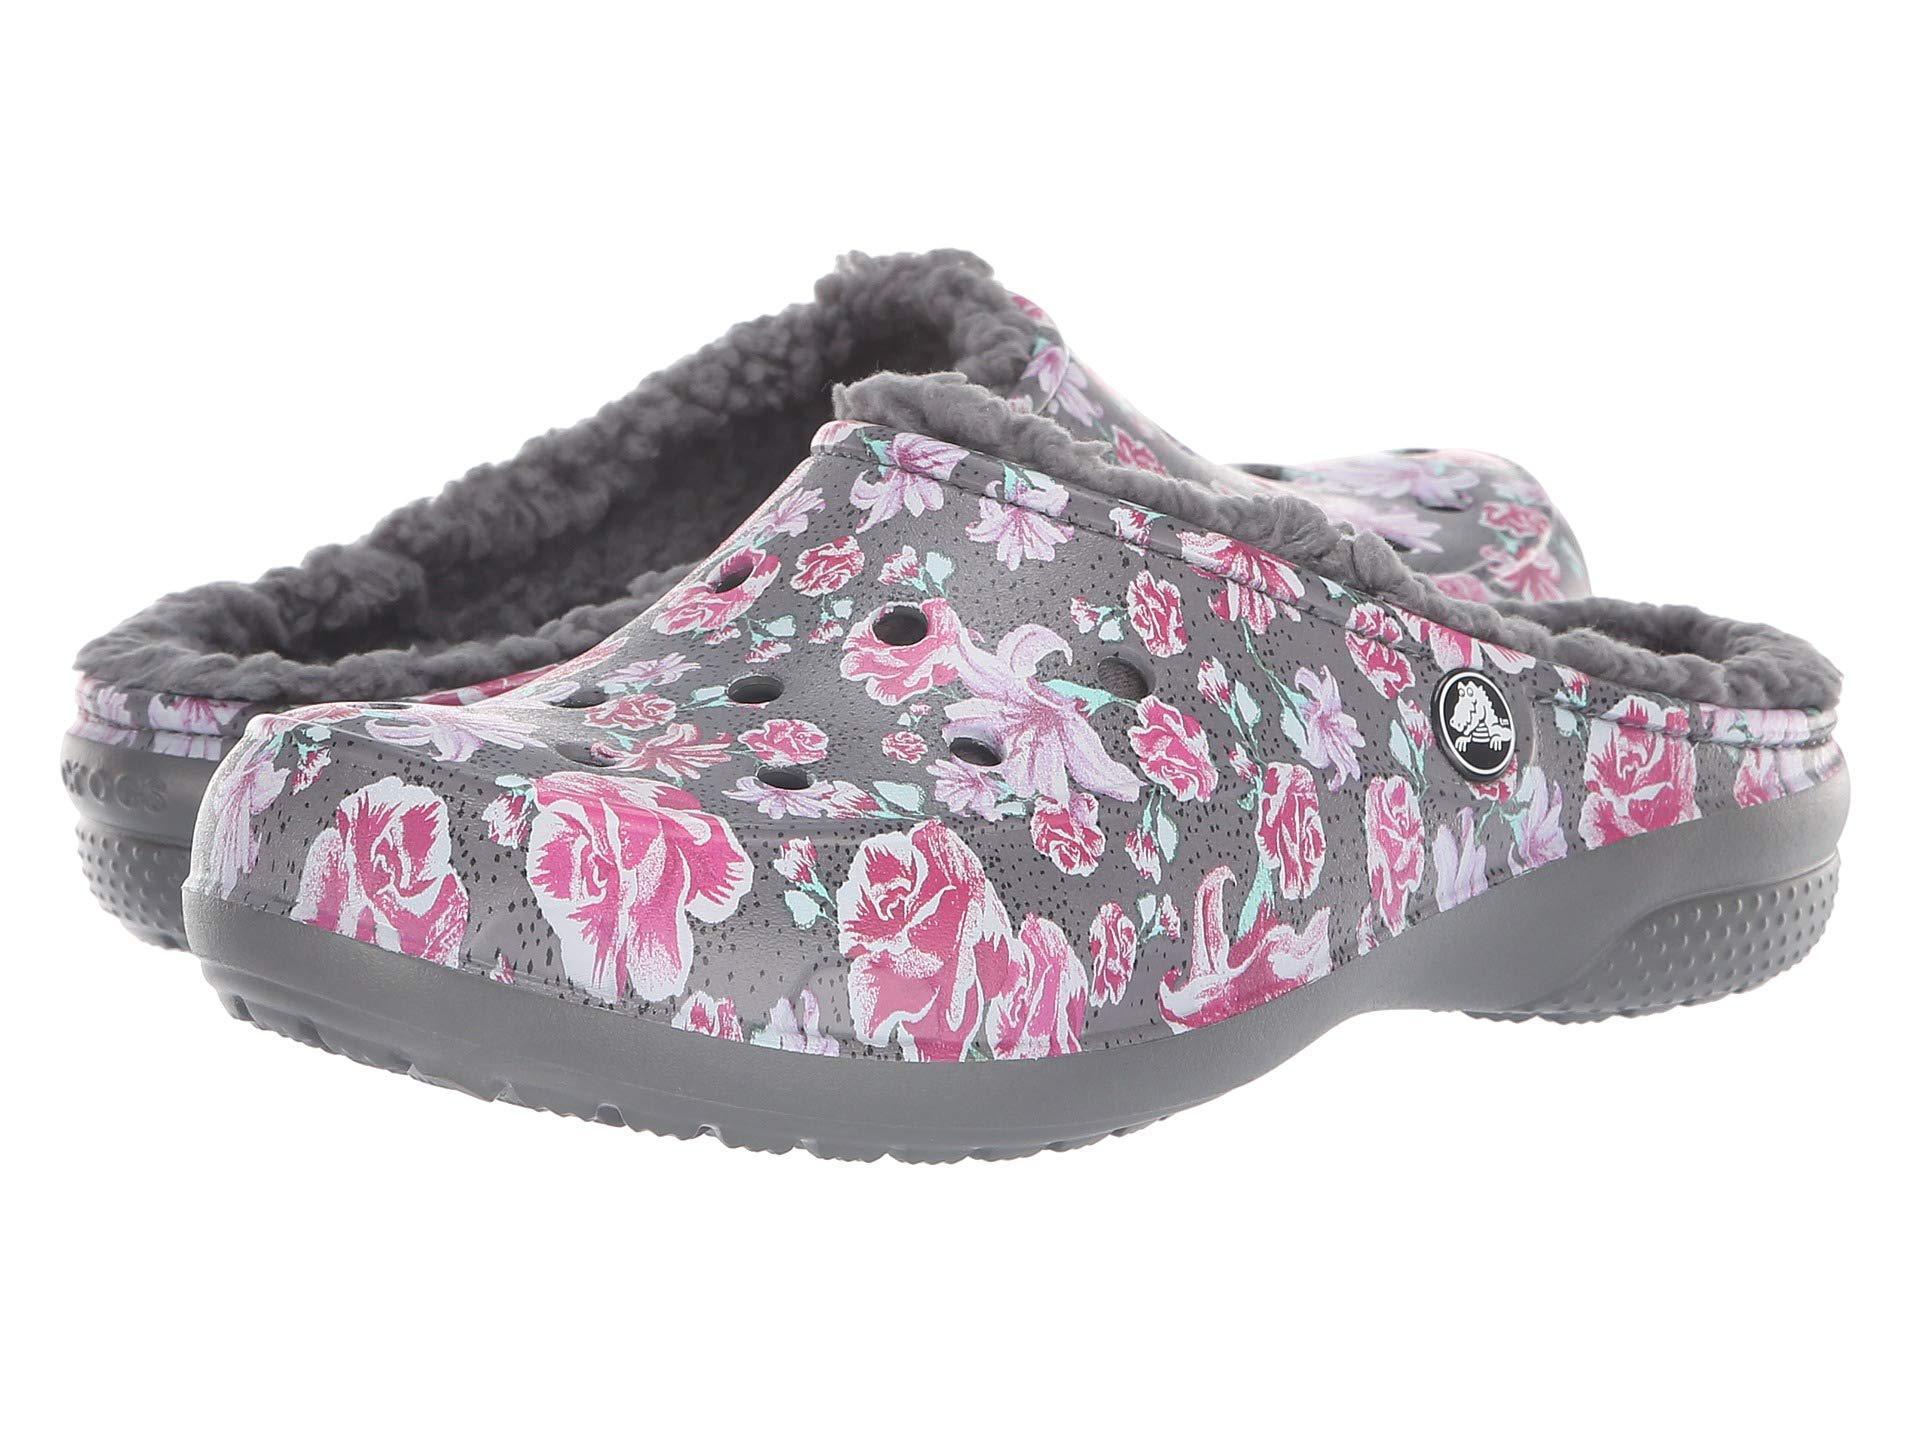 93a4d0303 Lyst - Crocs™ Freesail Graphic Lined (black floral) Women s Clog ...